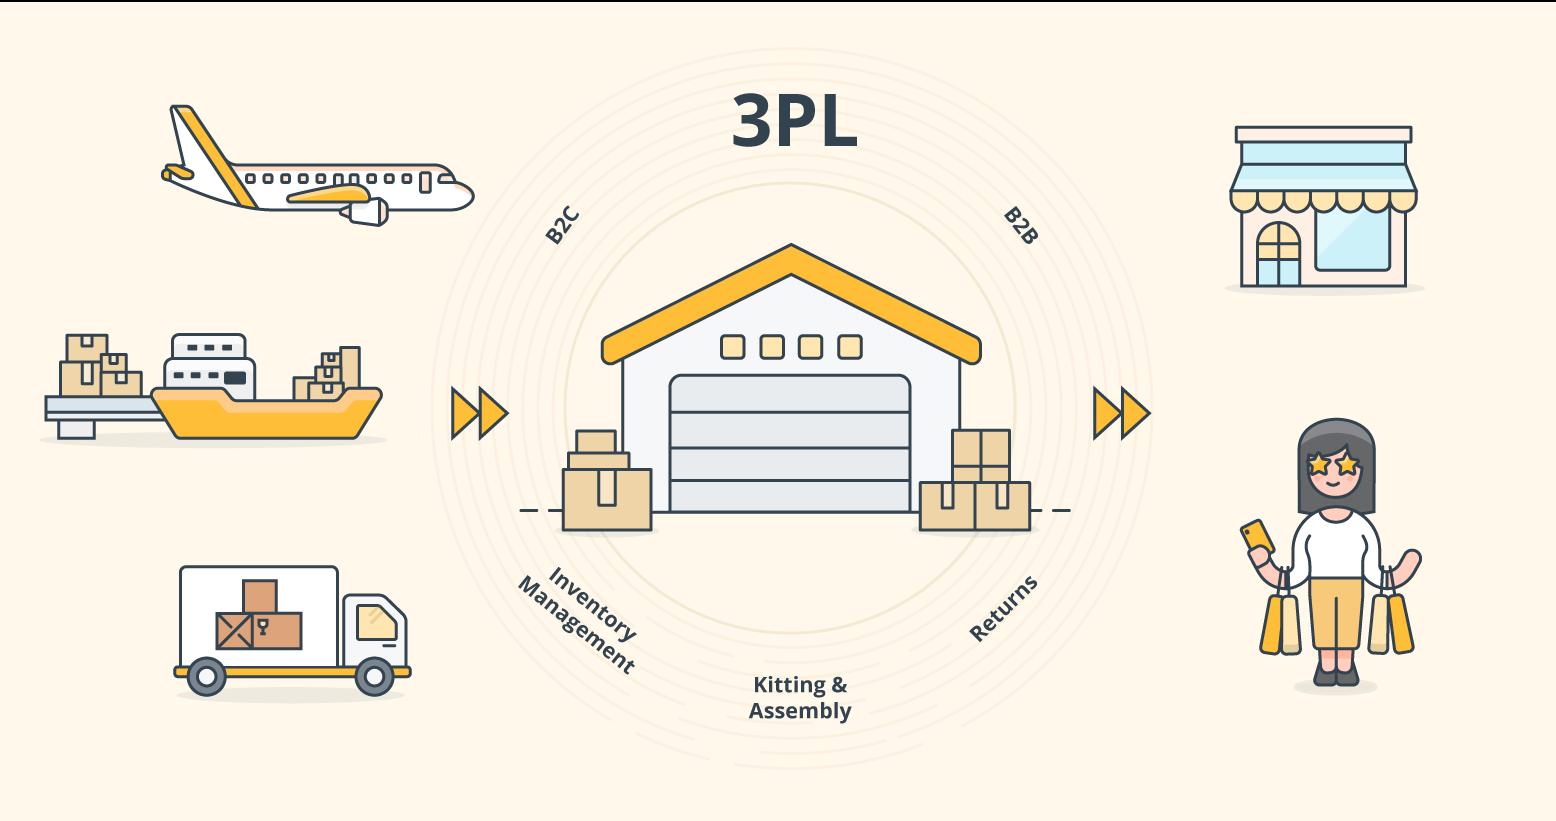 3PL process chart